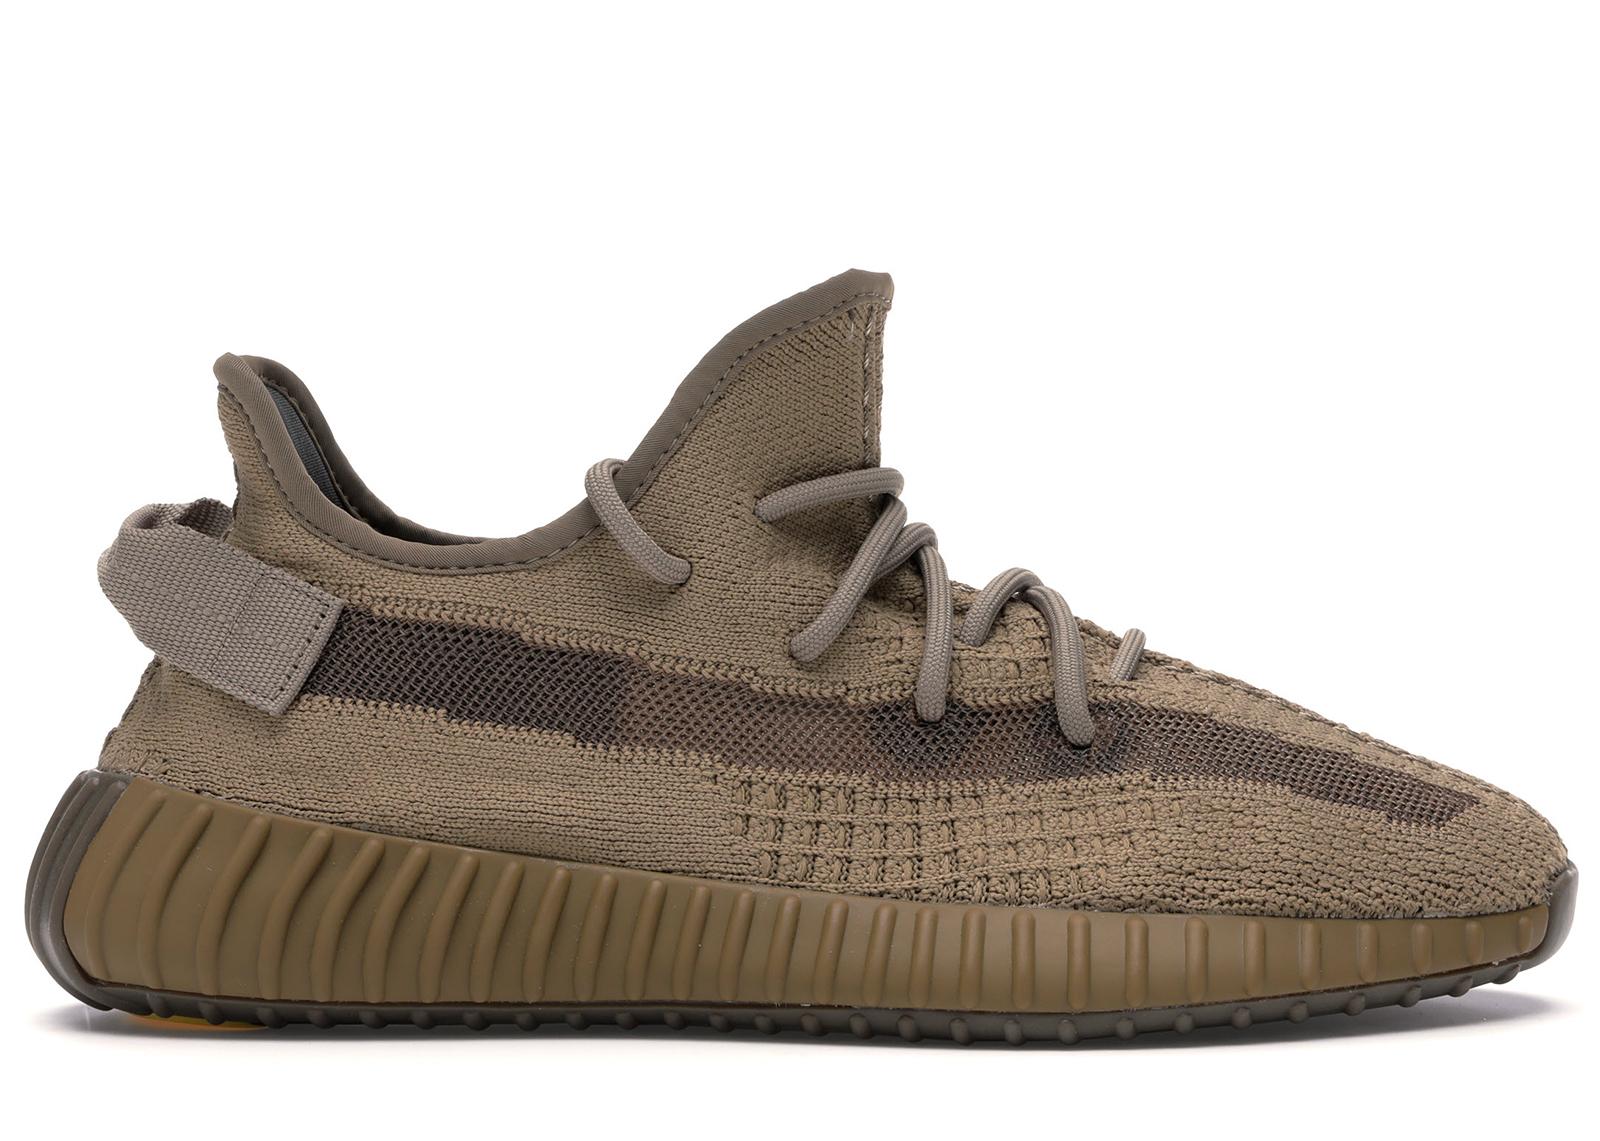 Buy adidas Yeezy 350 Shoes & Deadstock Sneakers